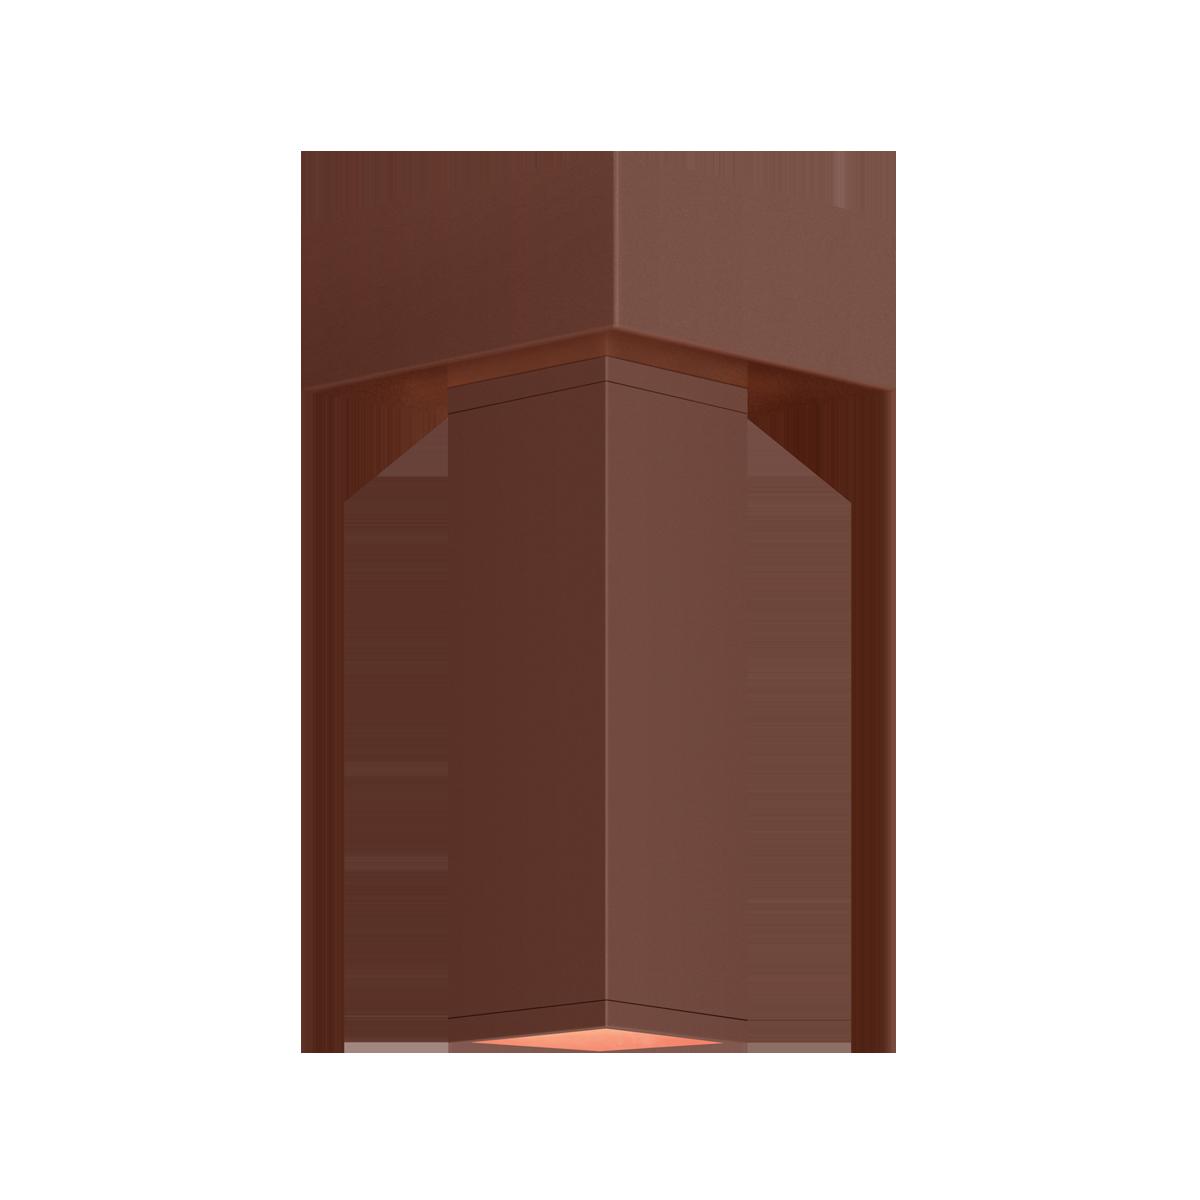 "2"" Square LED Flush Mount Cylinder, 3500K  -  90 CRI"